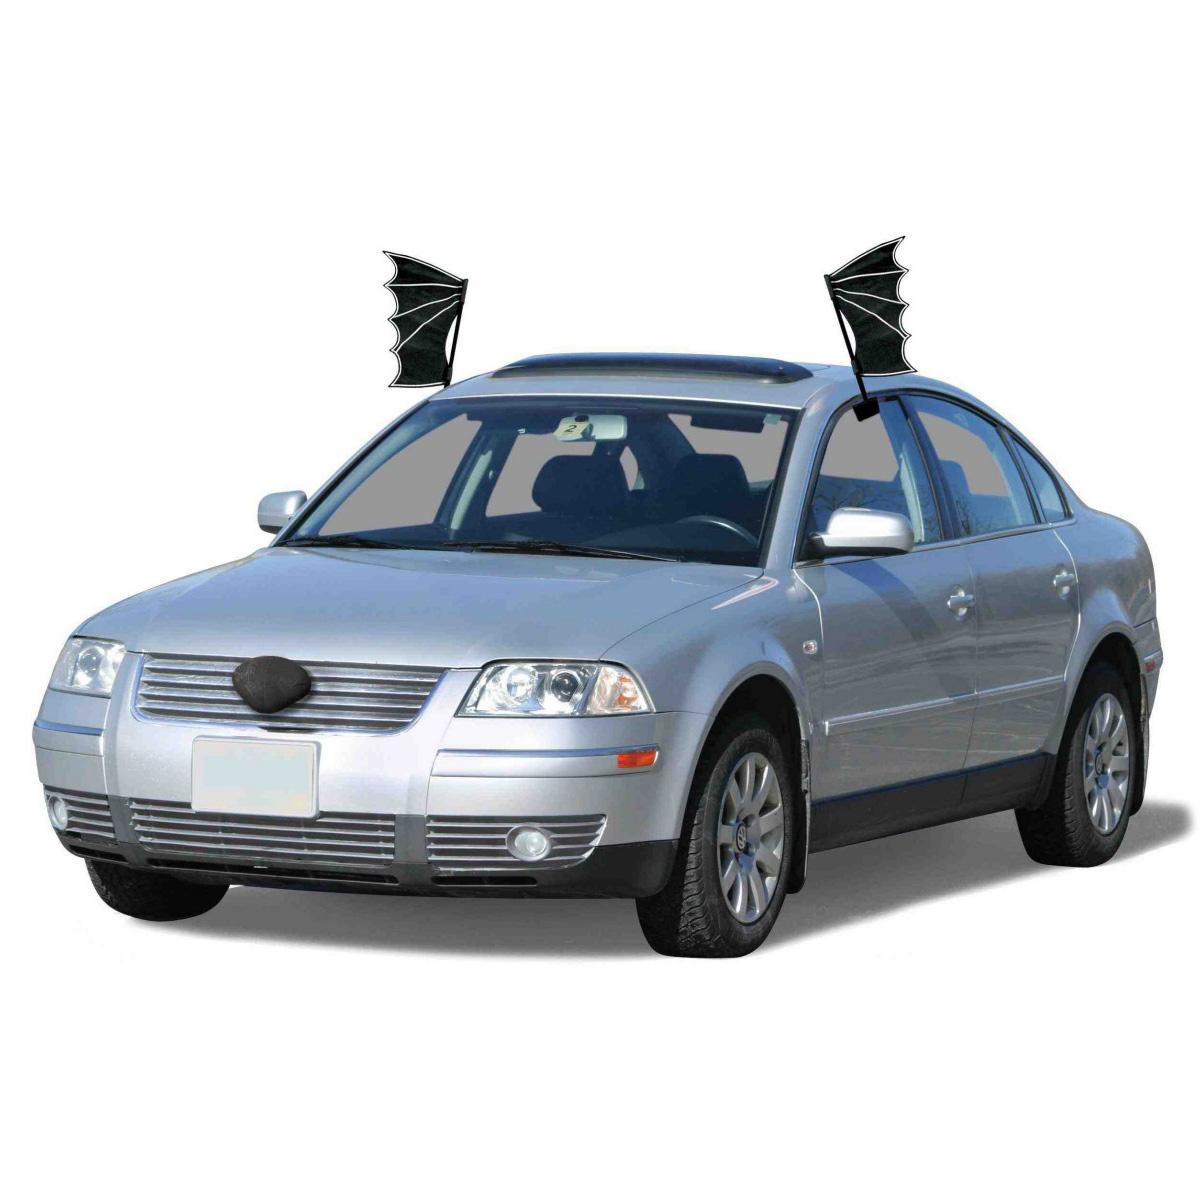 Black Bat Halloween Car Costume